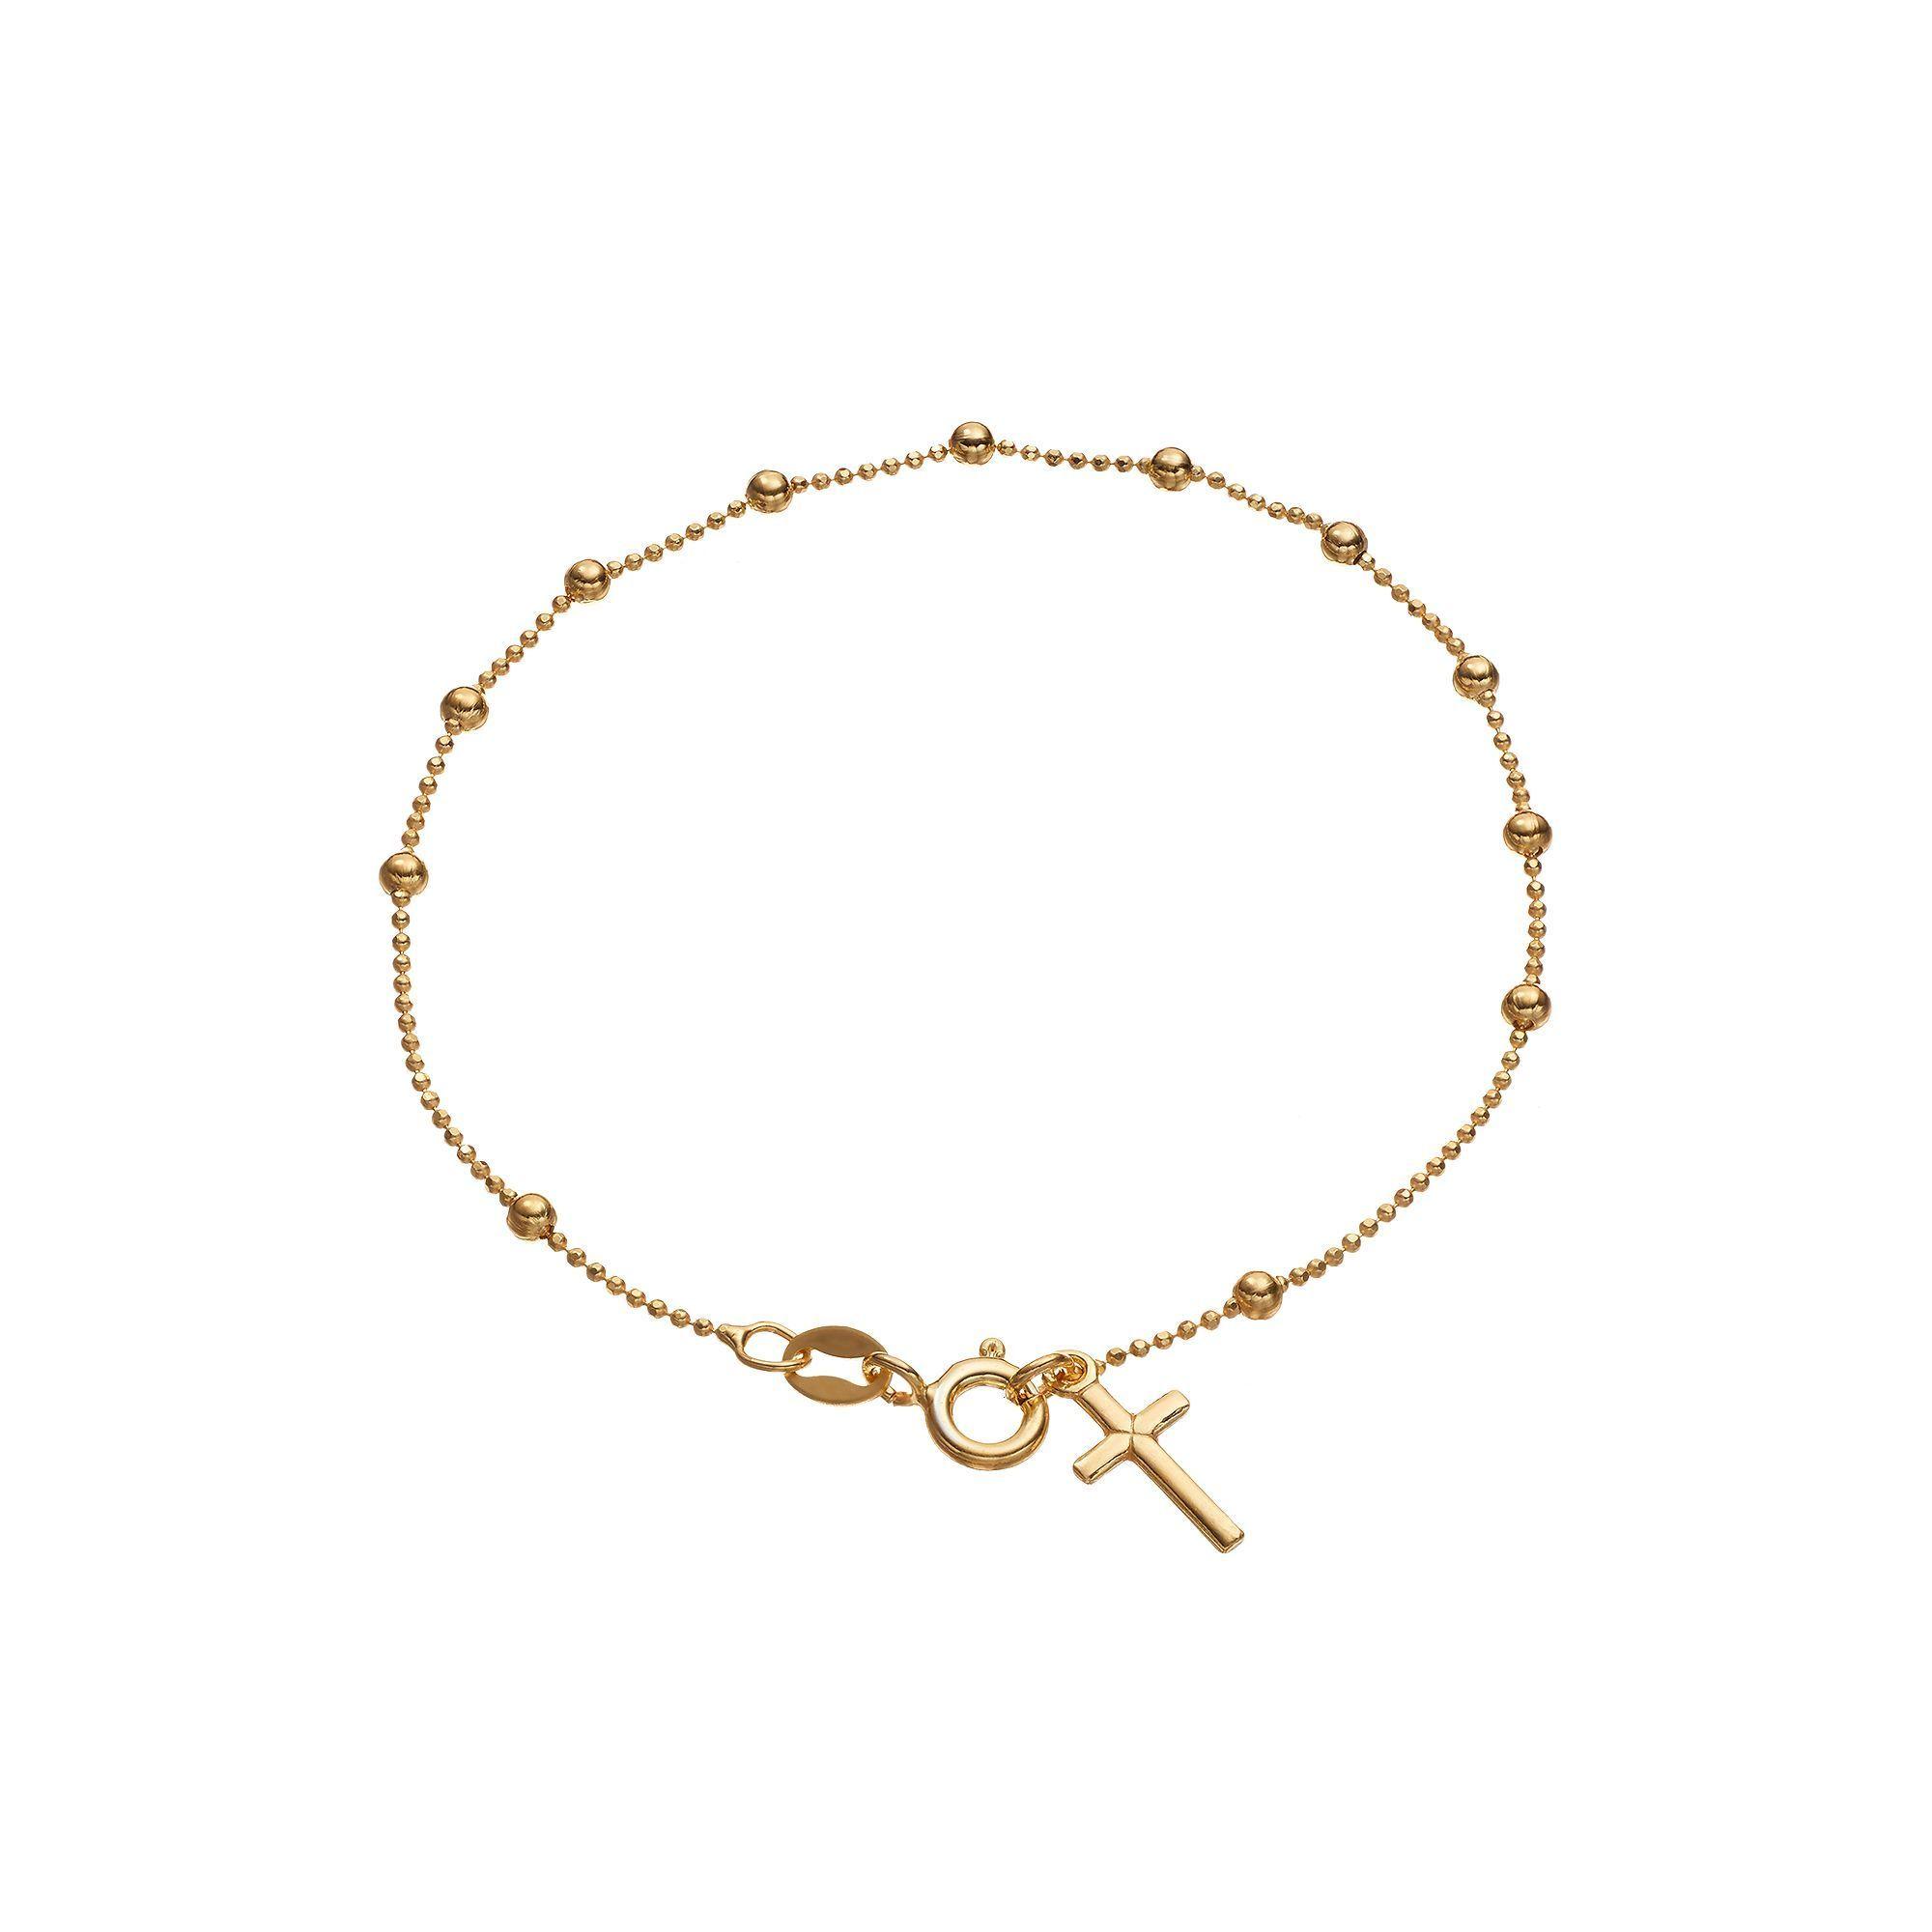 K gold bonded beaded chain u cross charm bracelet products